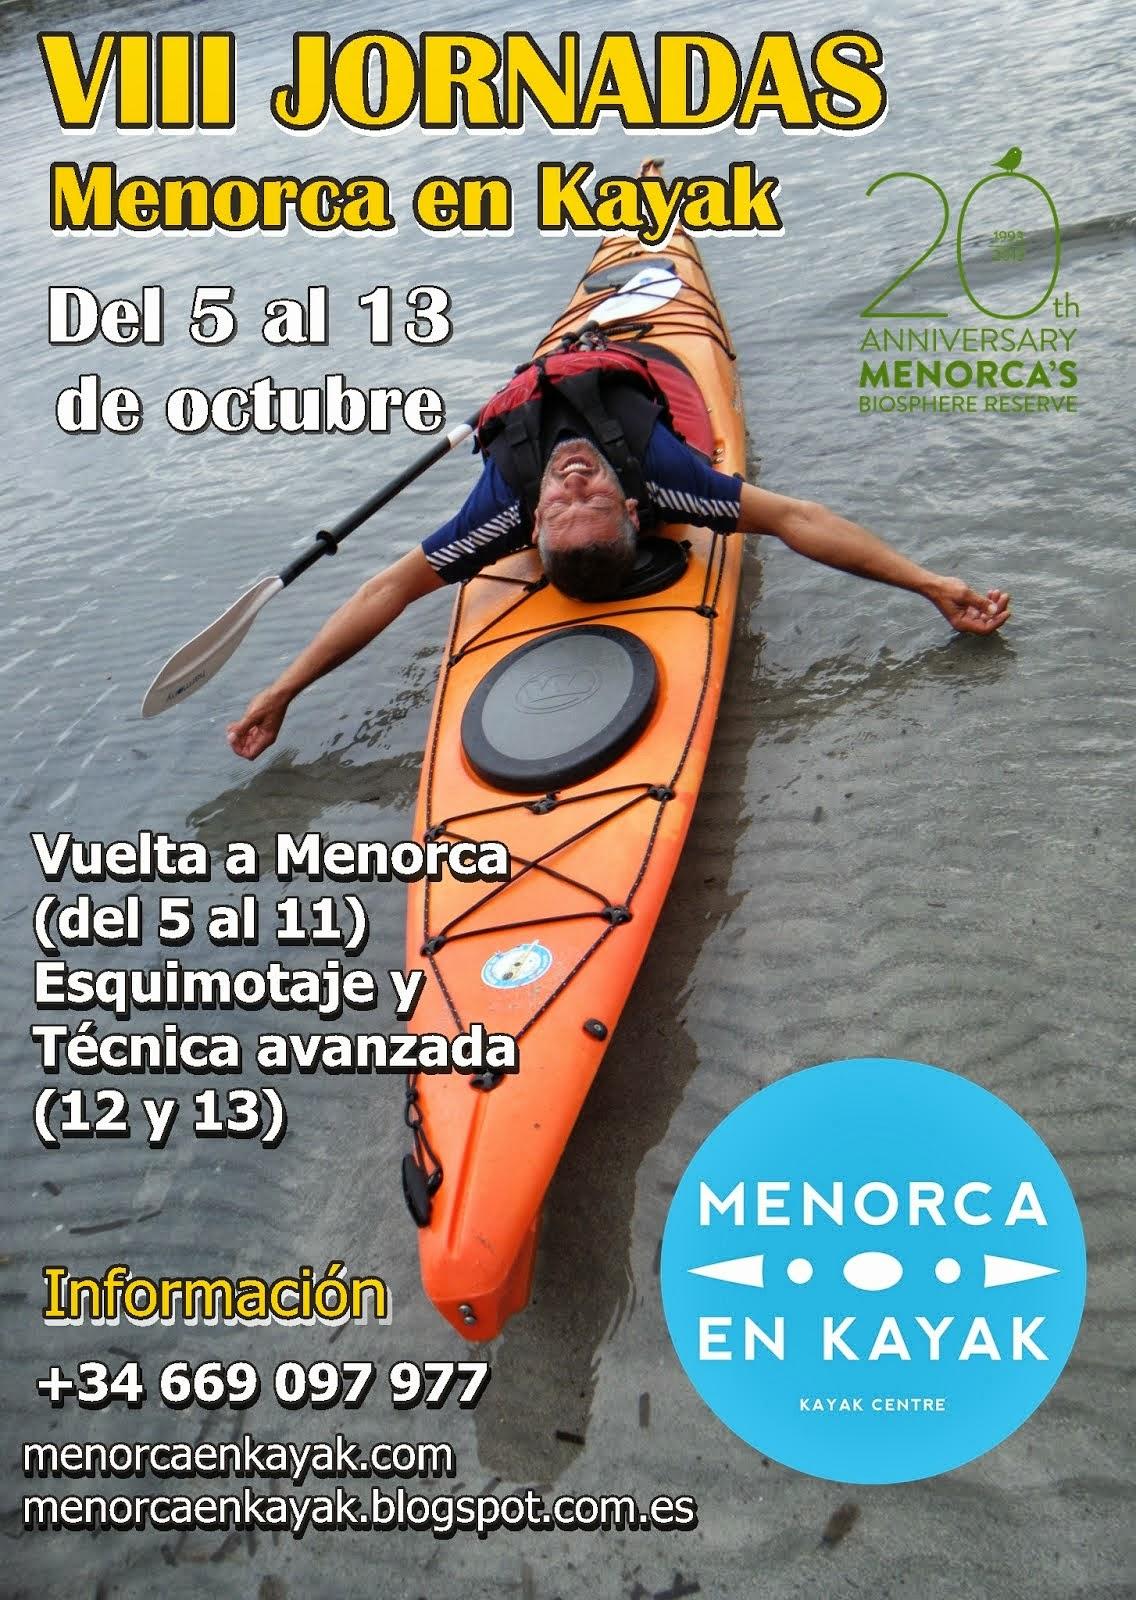 VIII JORNADAS MENORCA EN KAYAK